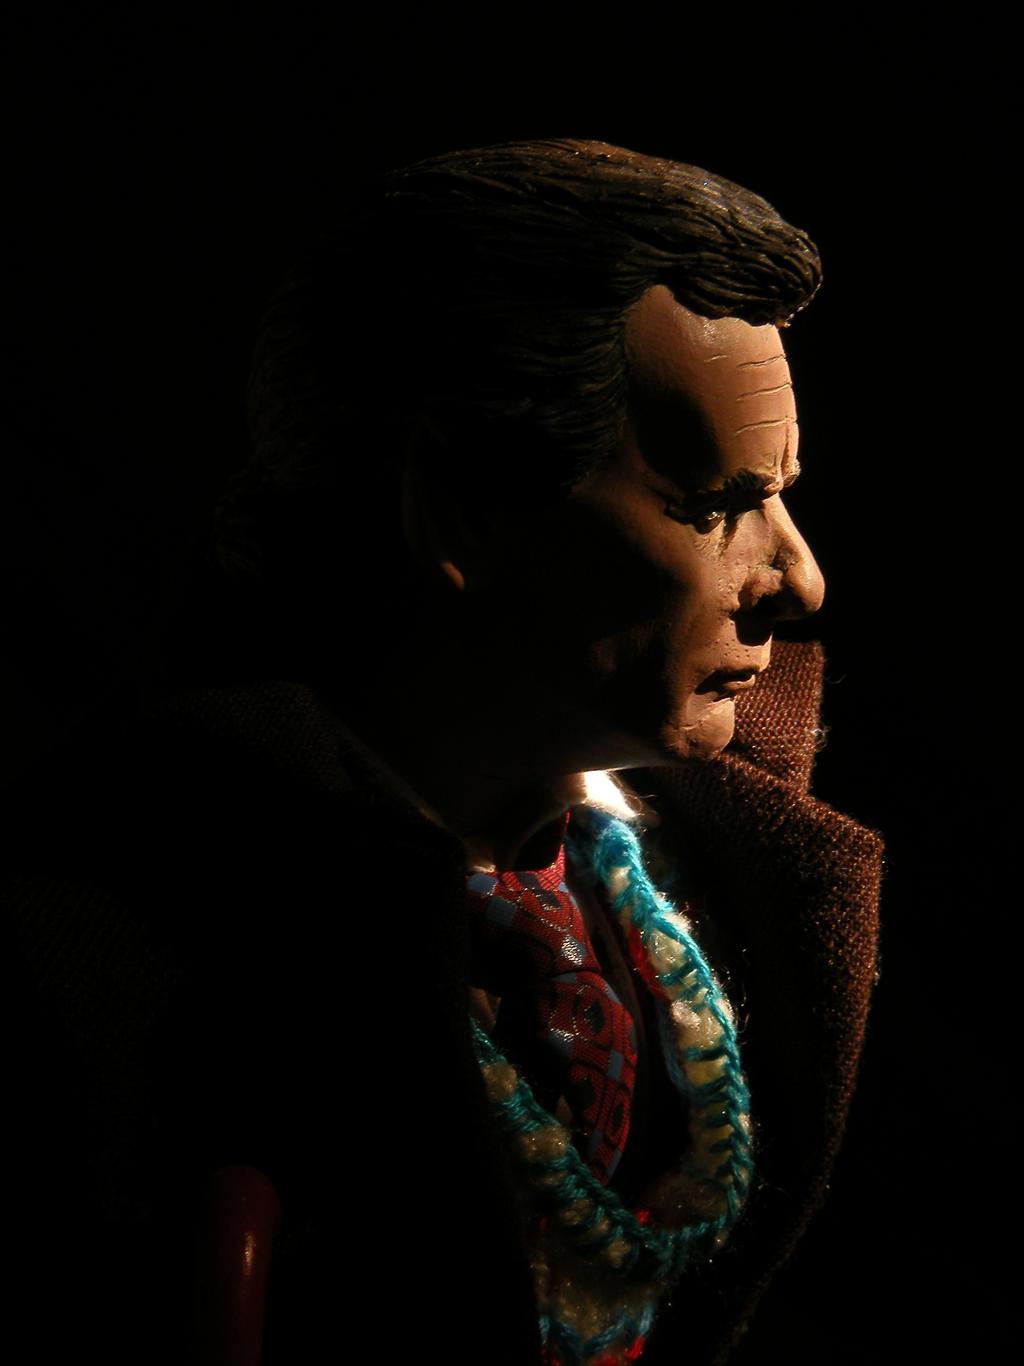 The Seventh Doctor by frasierdalek